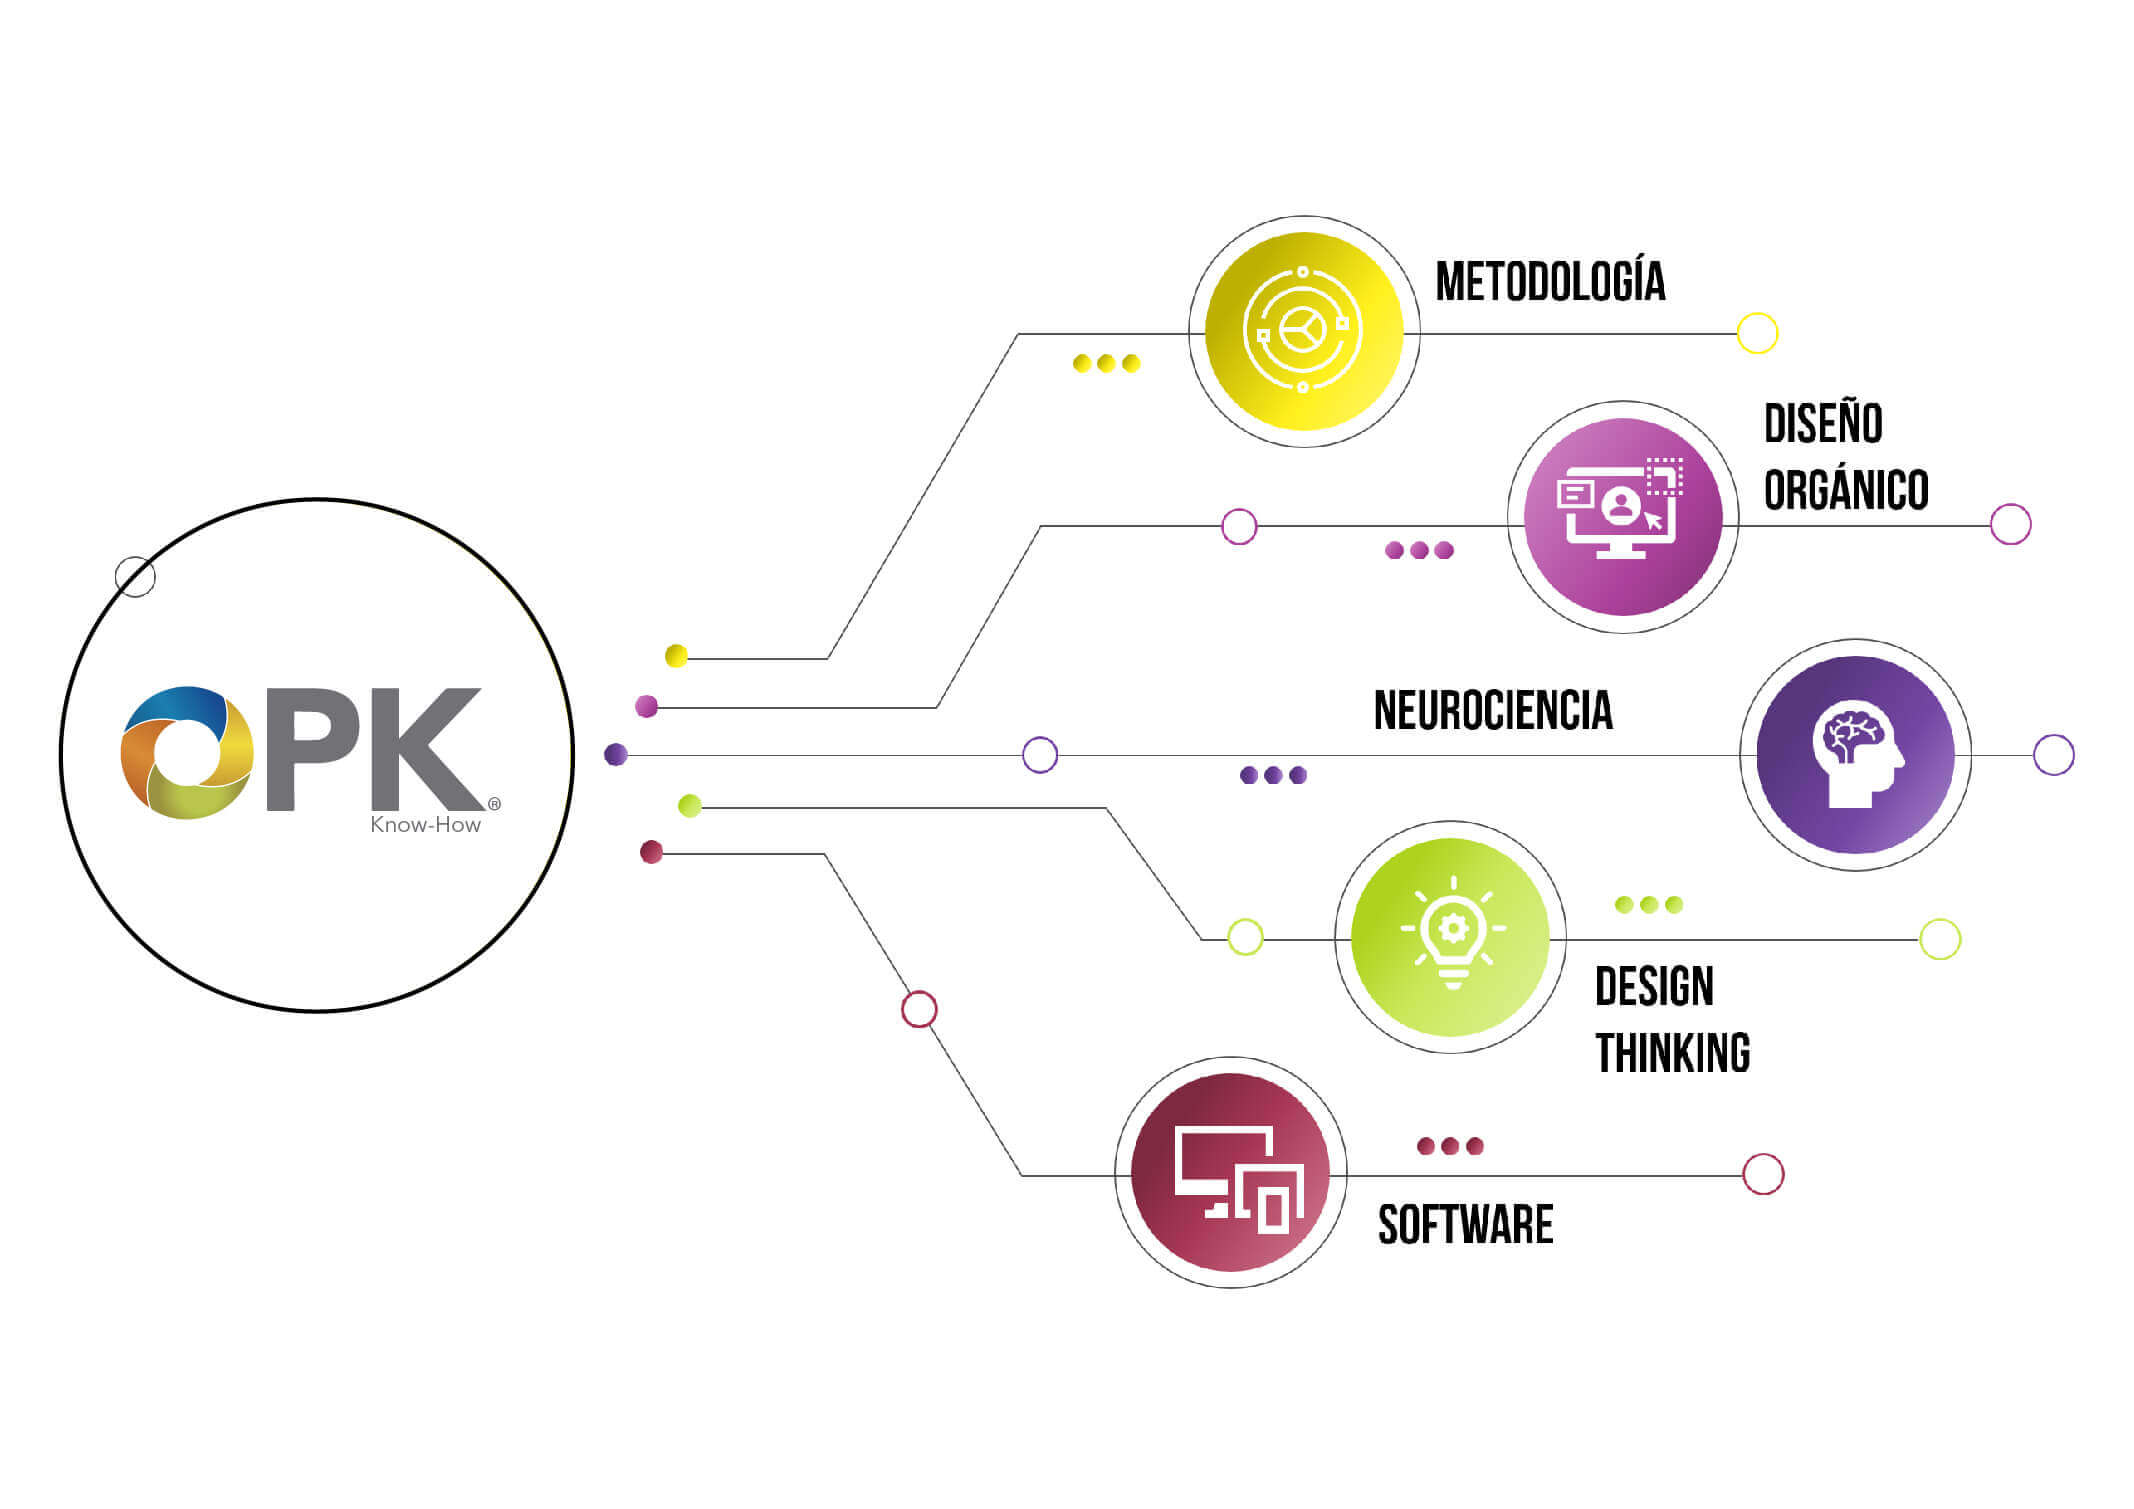 OPK Capacitacion online